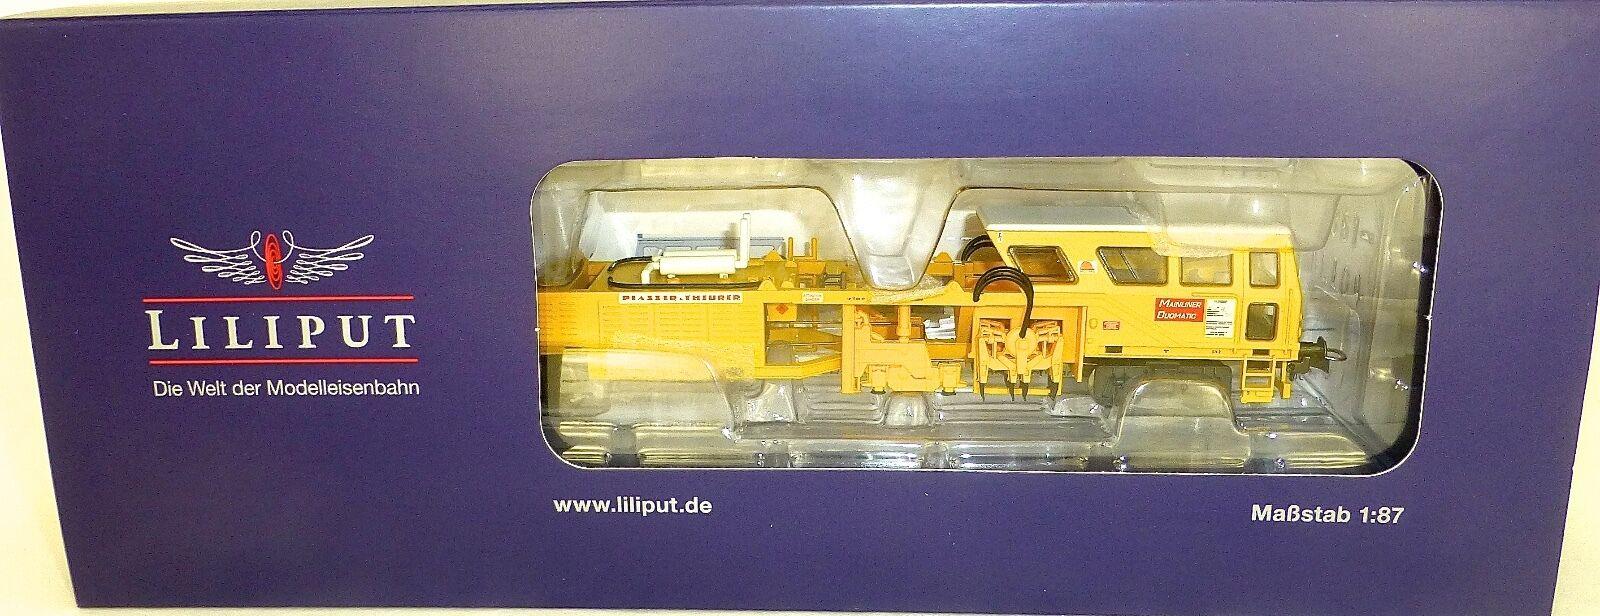 SNCF Gleisstopfmas ne seco Rail Epv Digitale liliput L136102 H0 1 87 HE6 Μ